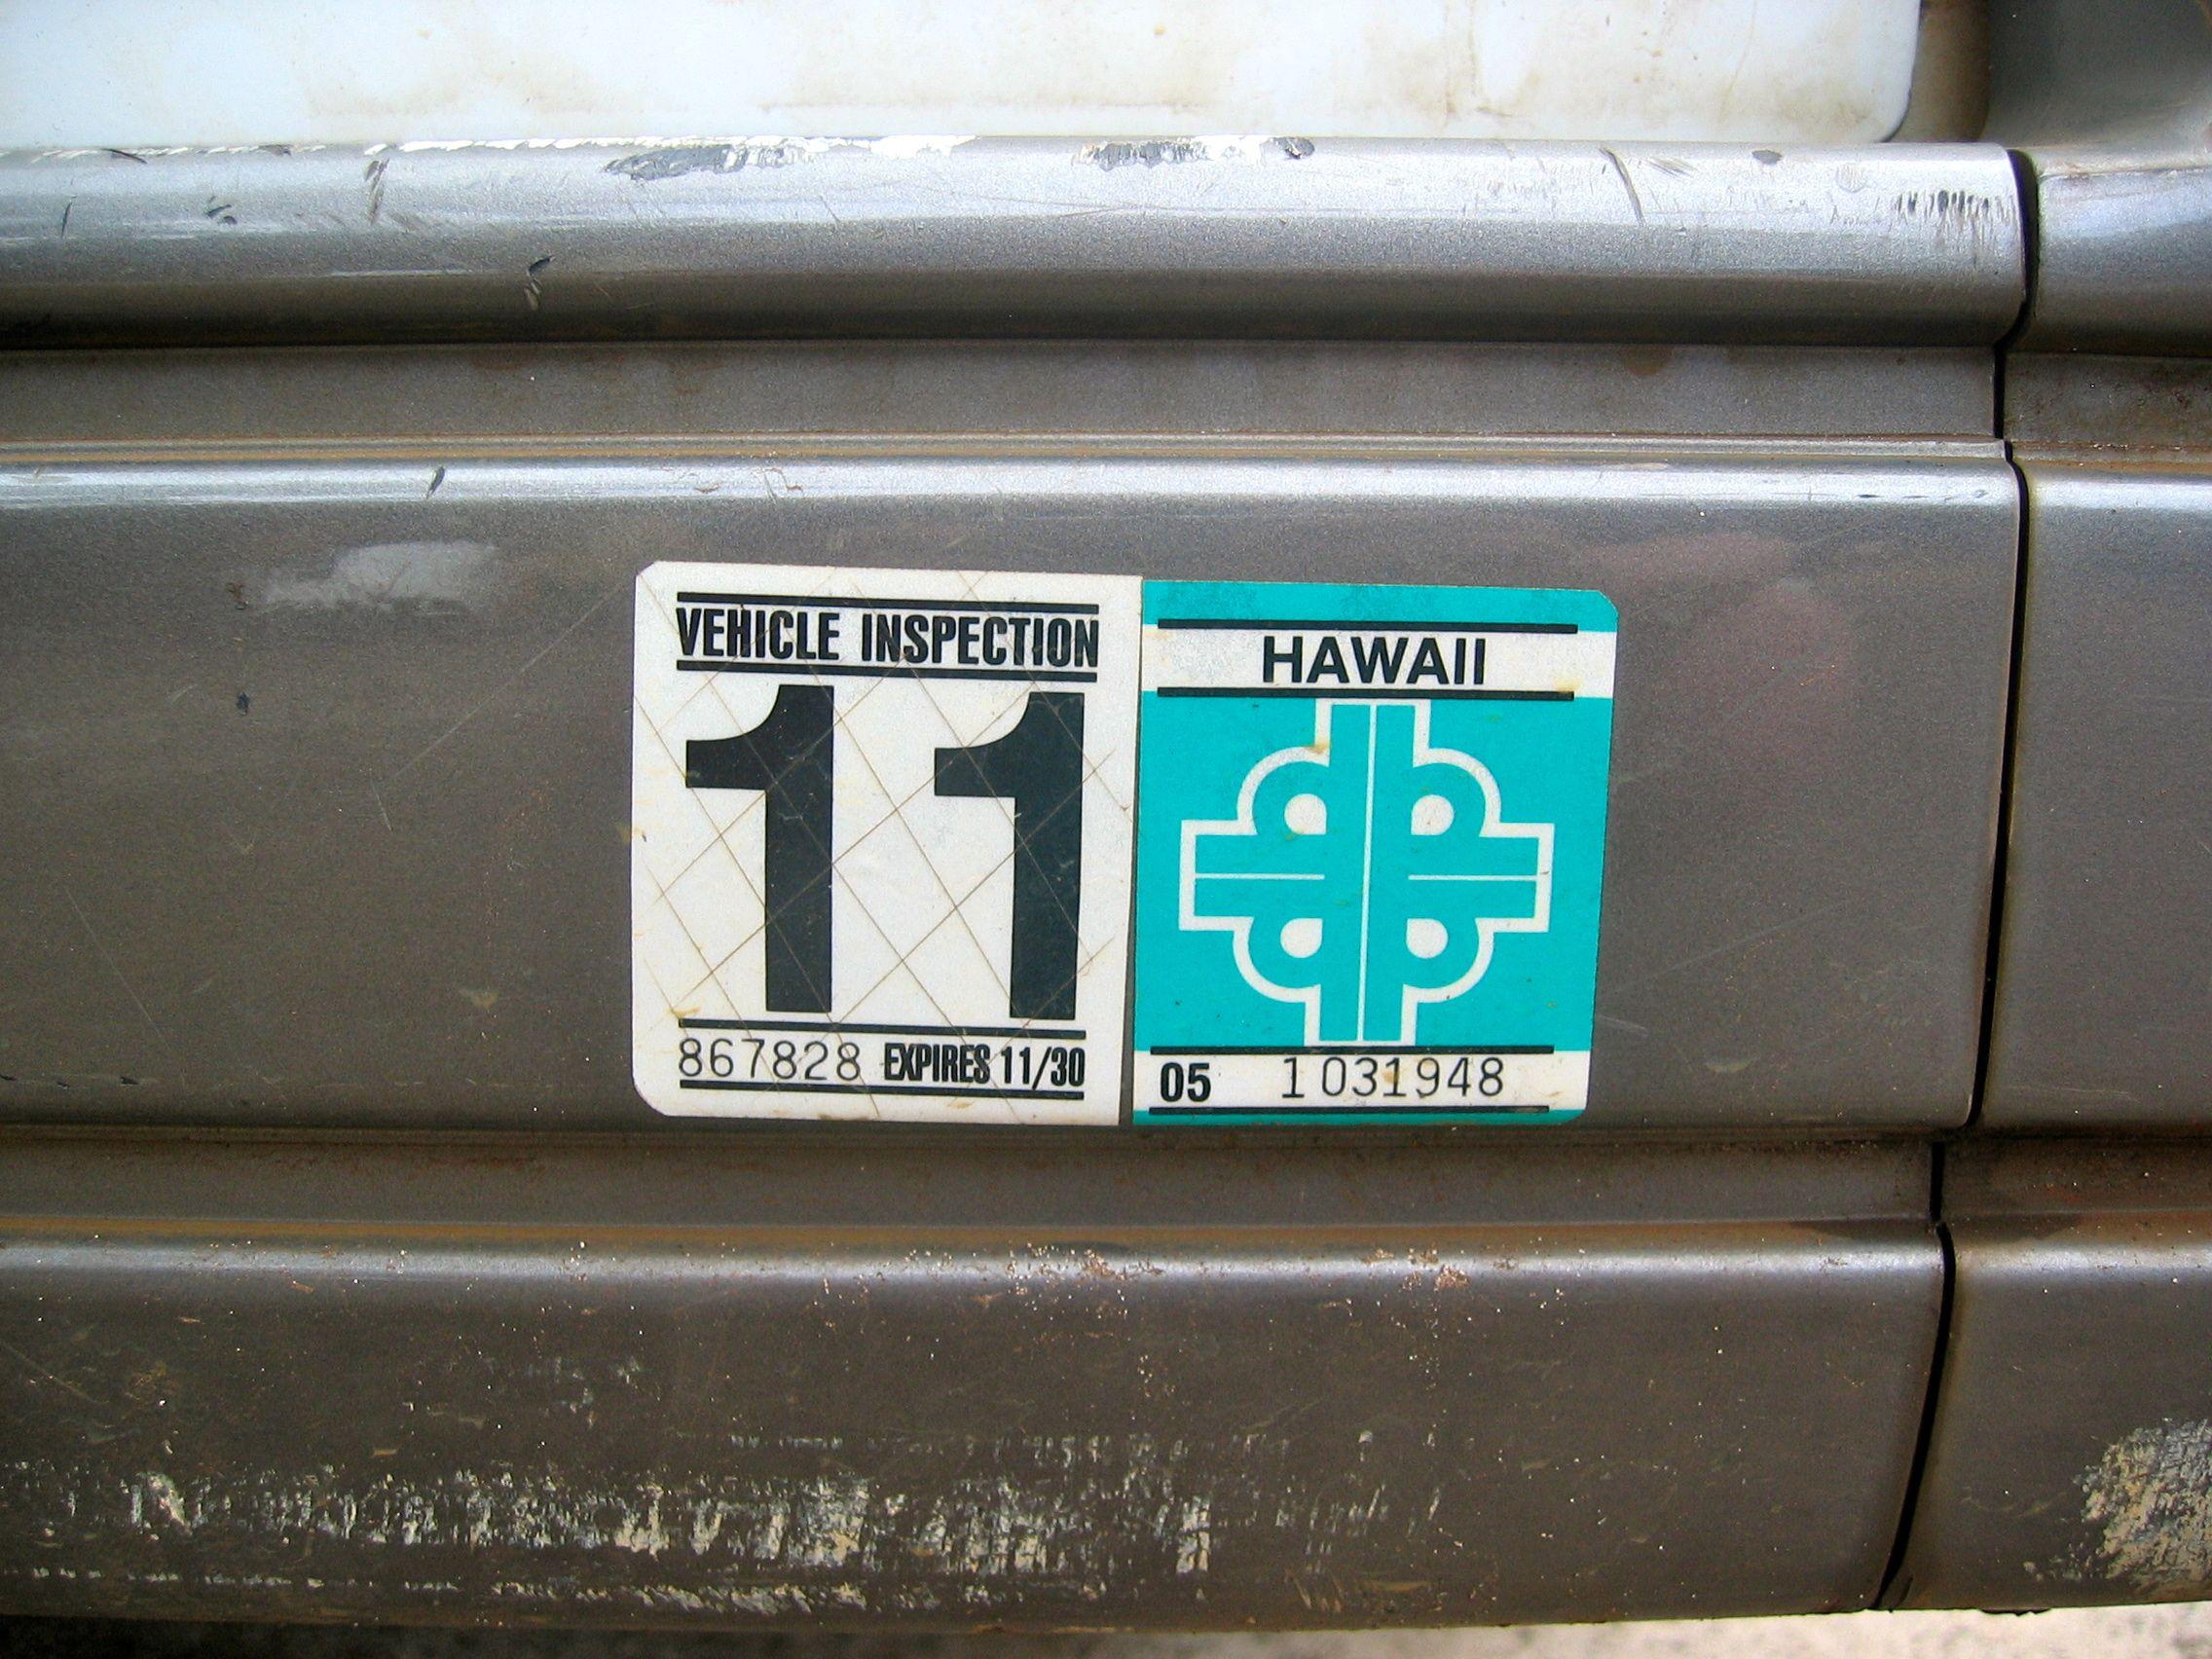 Hawaii Car Sticker Vehicle Inspection Car Stickers Car [ 1704 x 2272 Pixel ]